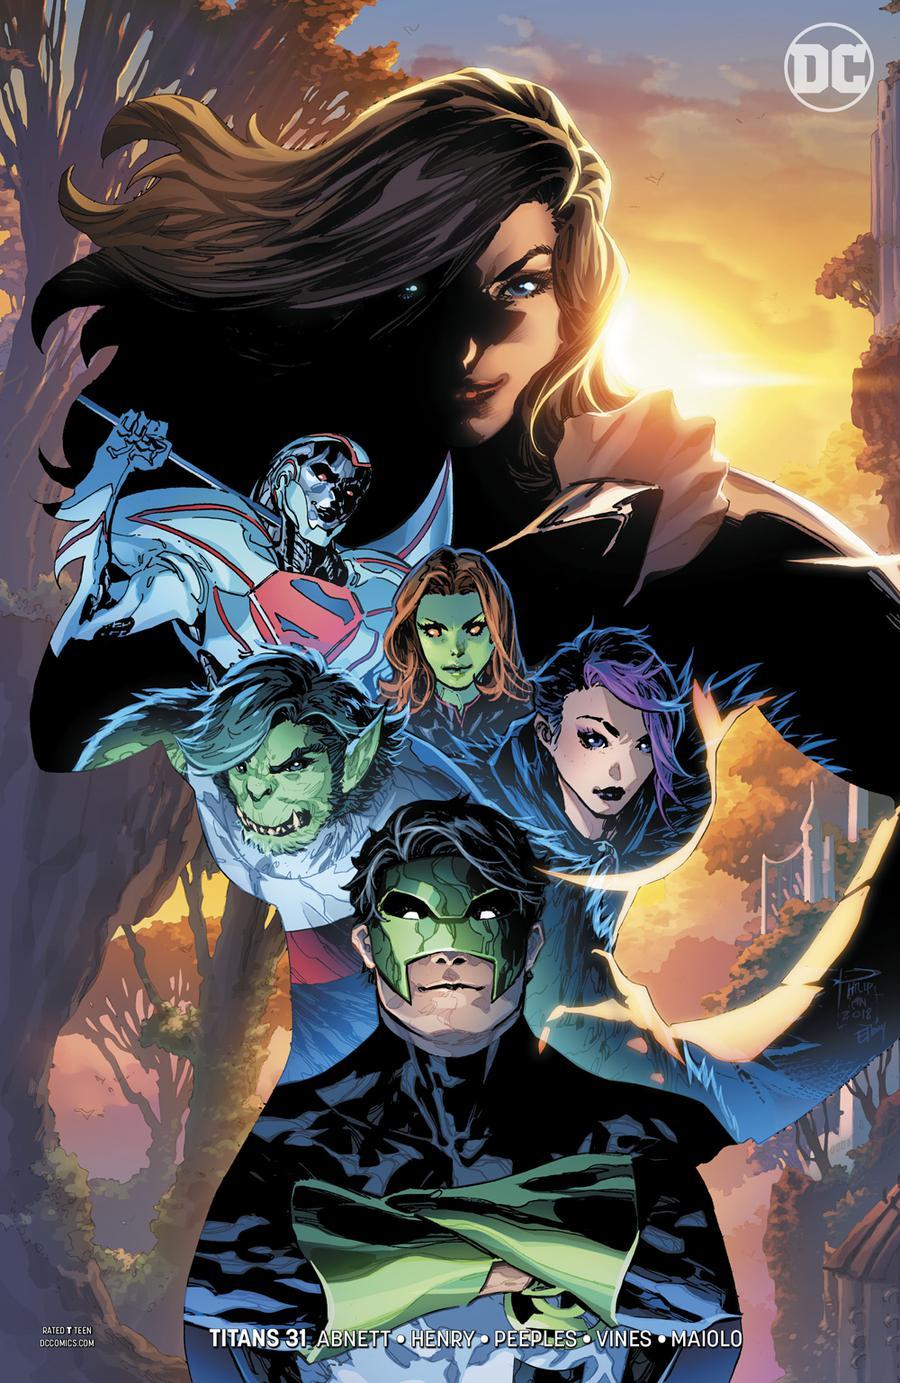 Titans Vol 3 #31 Cover B Variant Philip Tan Cover